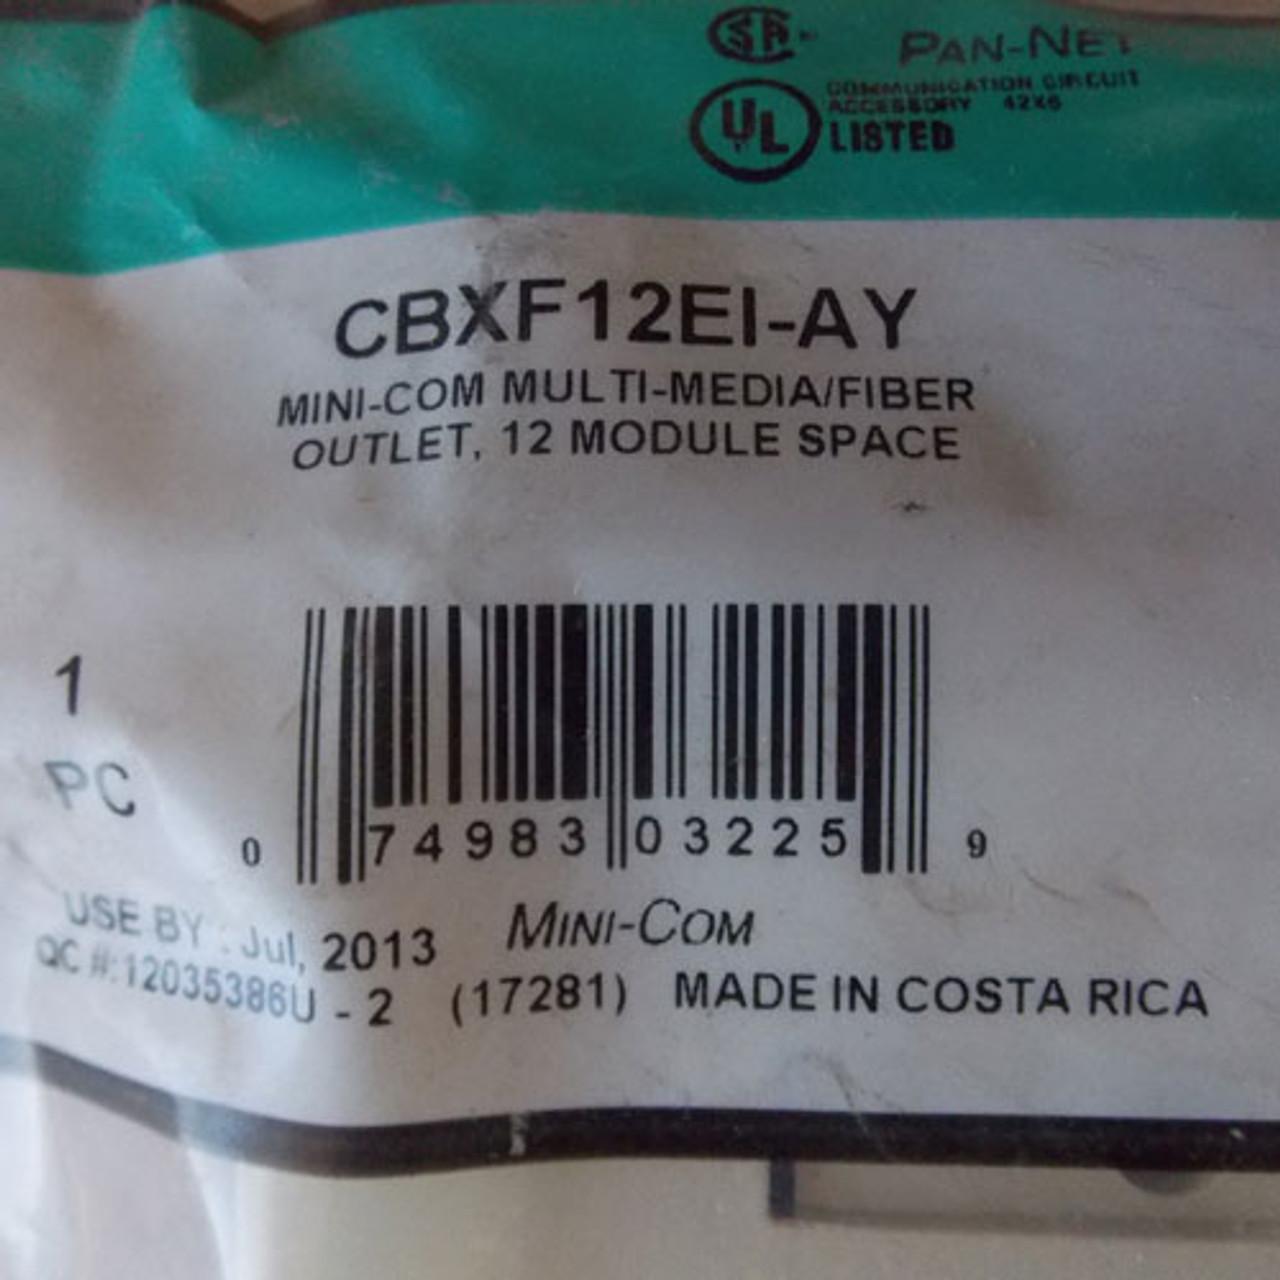 Panduit CBXF12EI-AY Mini-Com Multi-Media/Fiber Outlet, 12 Module Space - New